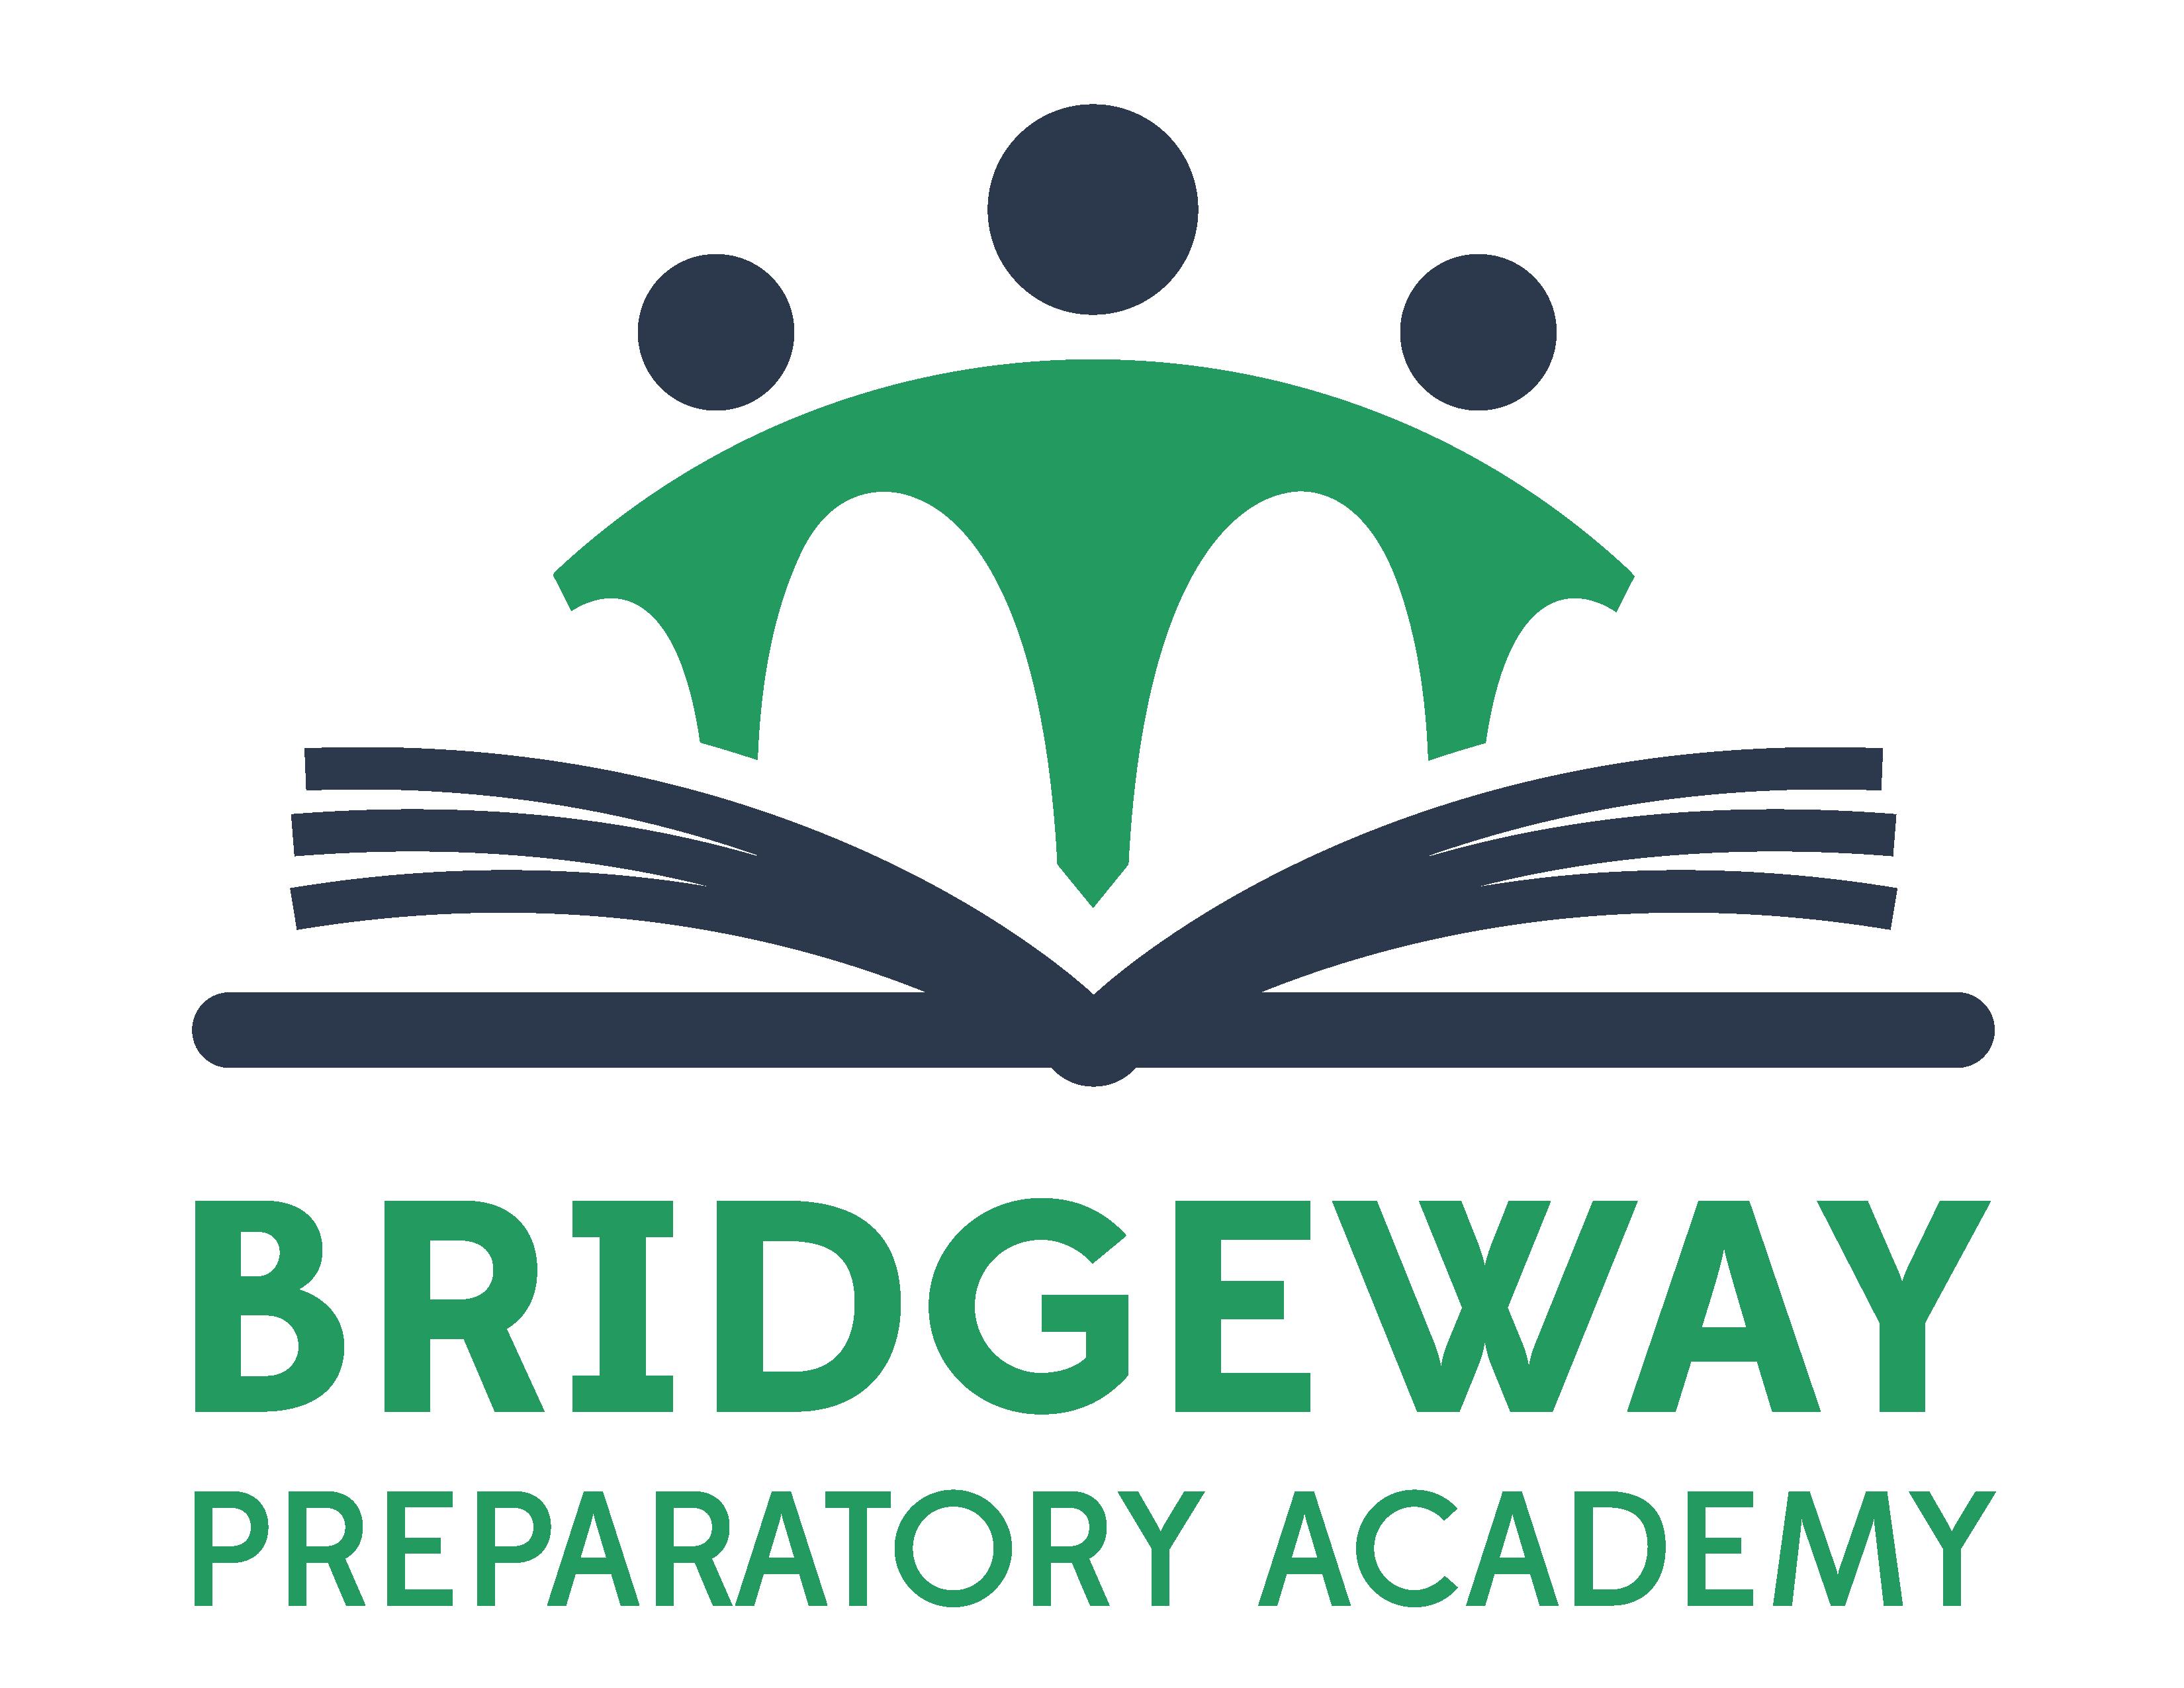 Bridgeway Preparatory Academy